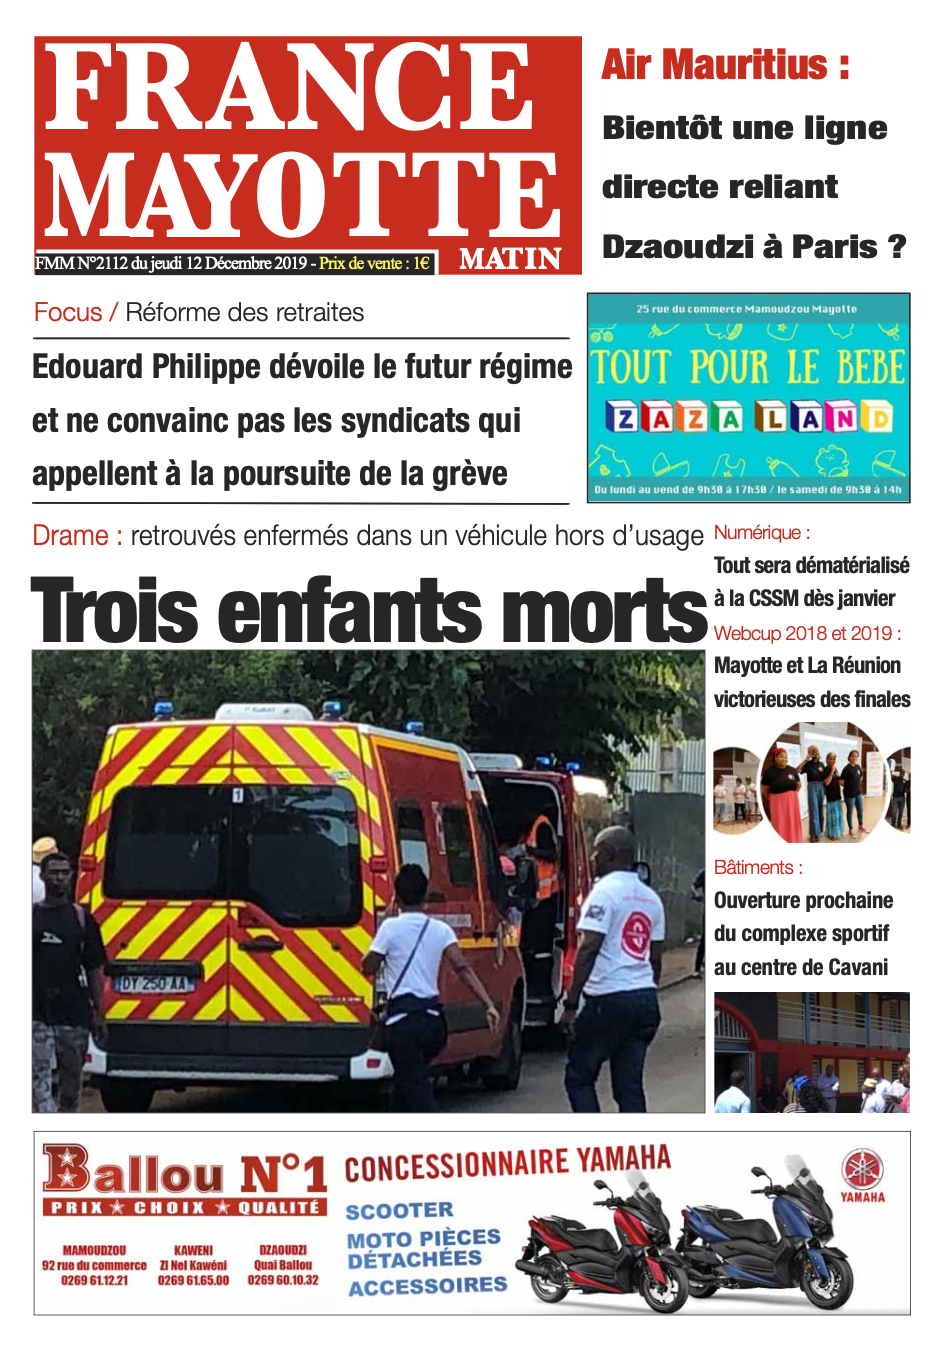 France Mayotte Jeudi 12 décembre 2019